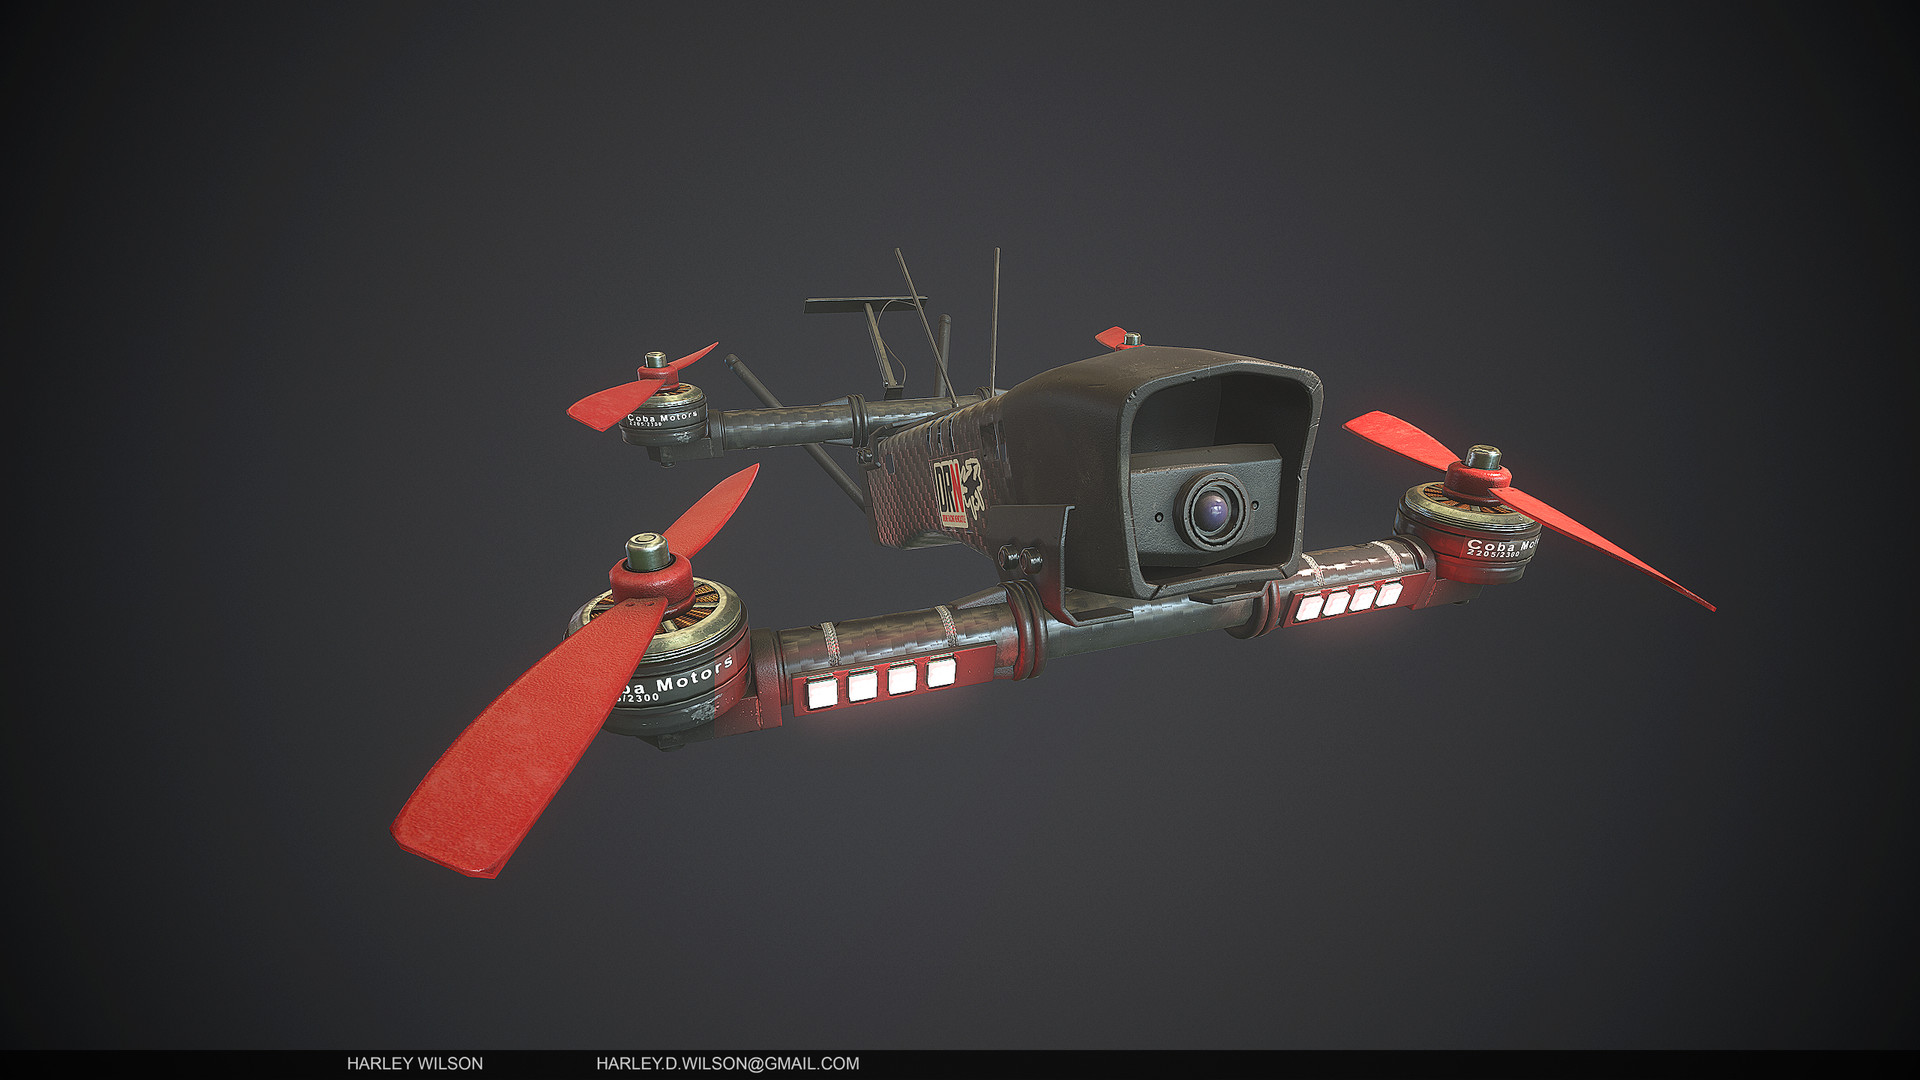 Harley wilson as drone c